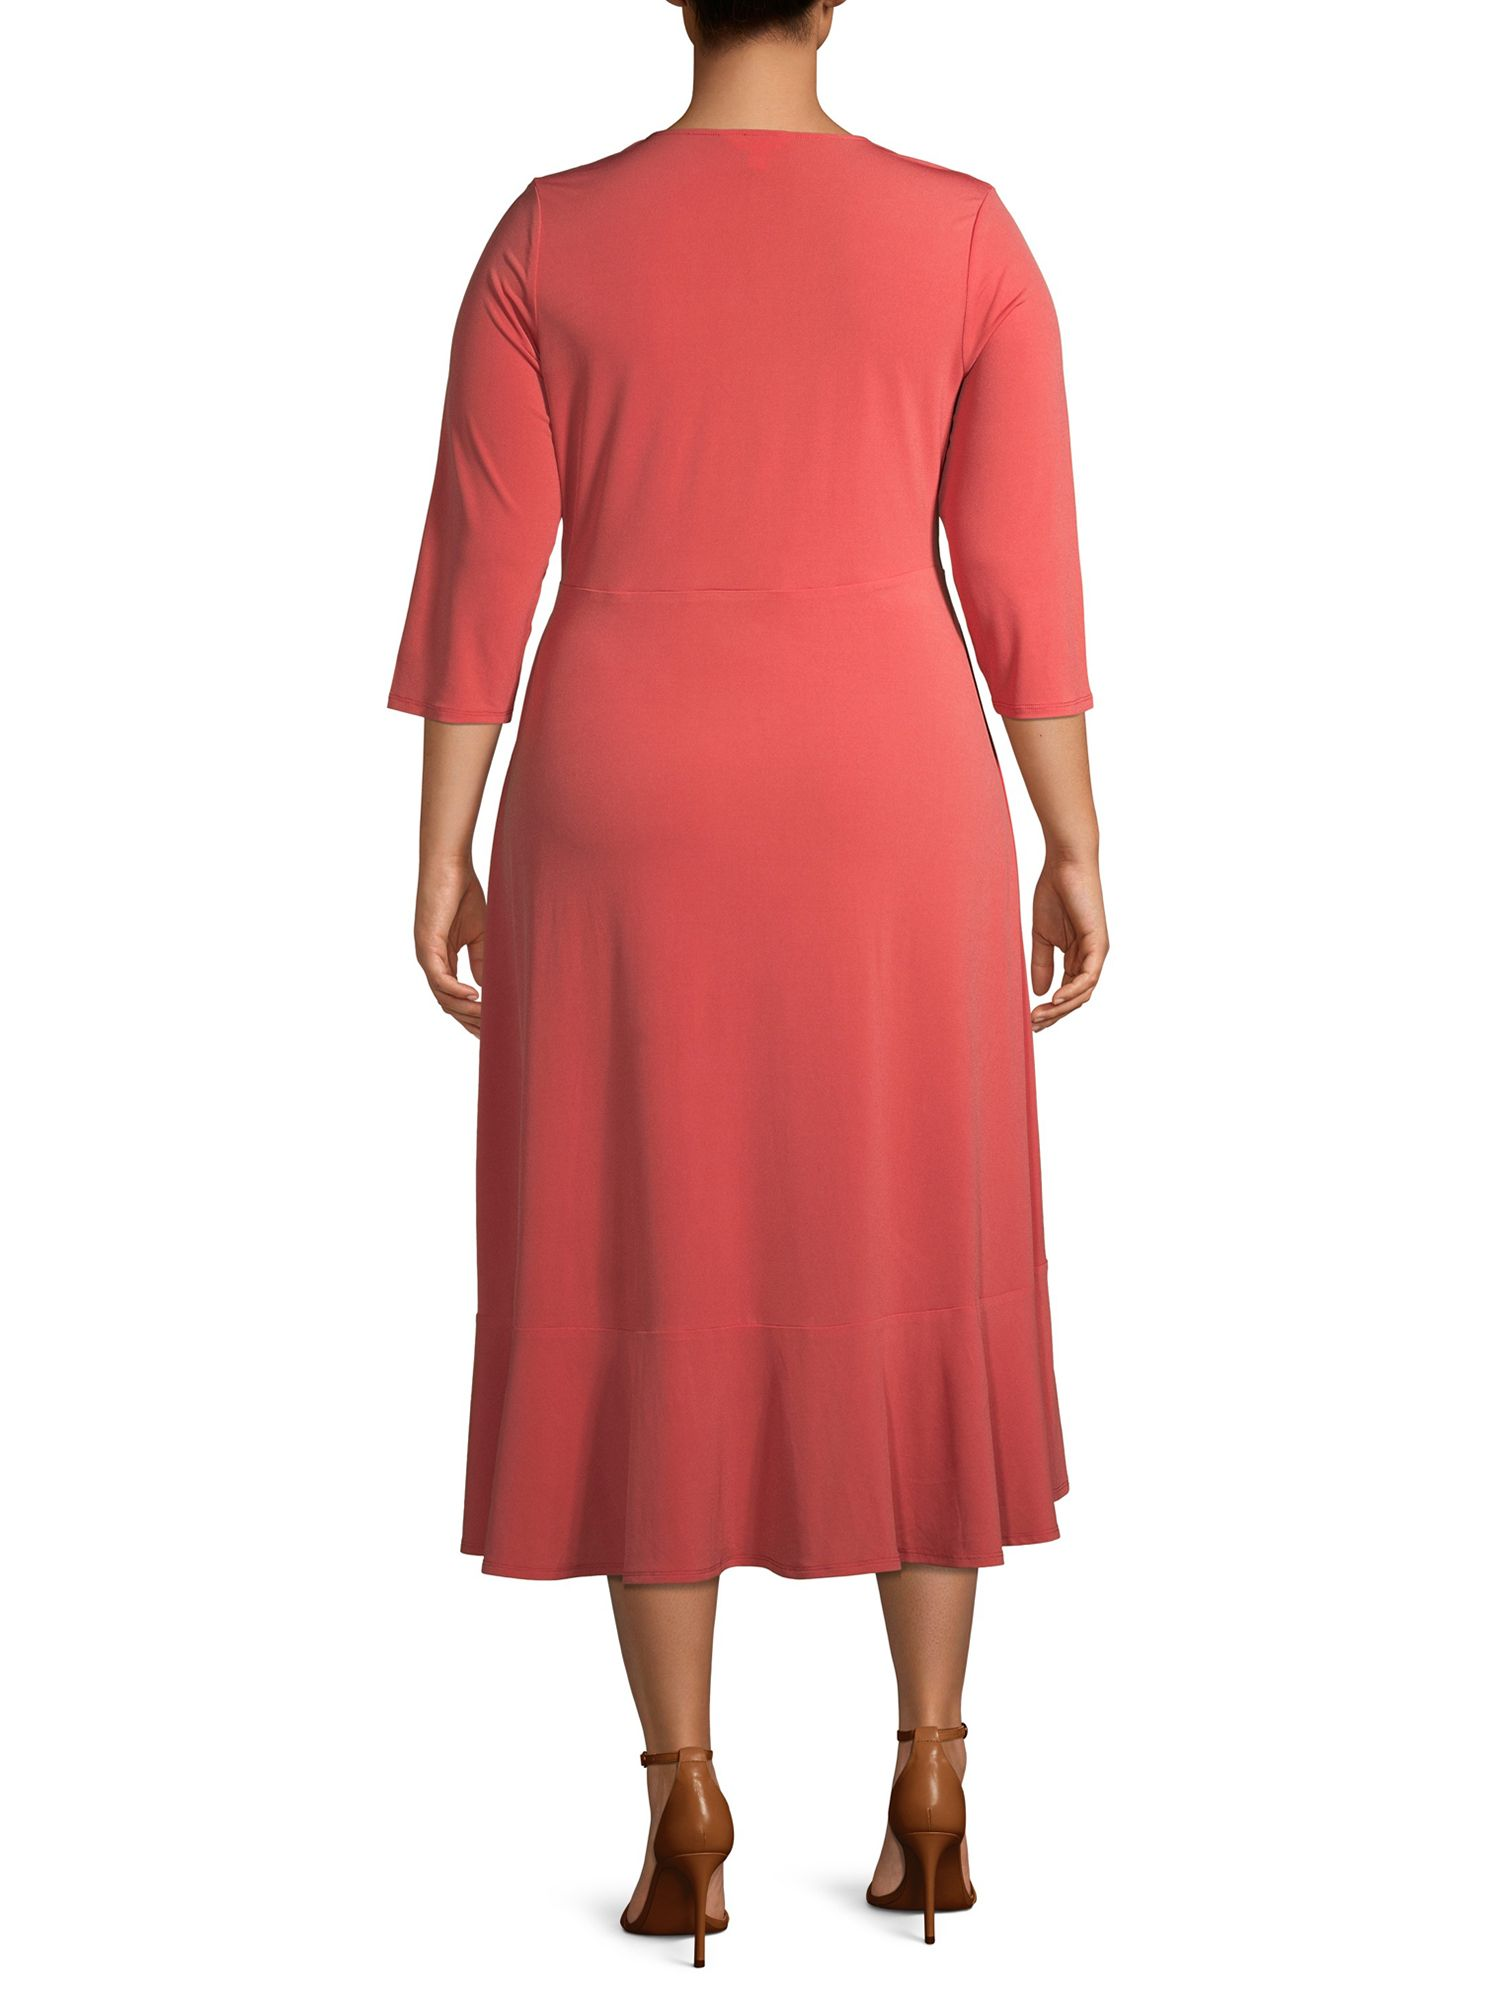 Terra Sky Terra Sky Women S Plus Size Solid Wrap Dress With Ruffle Detail Walmart Com Belted Midi Dress Fit And Flare Dress Dresses [ 2000 x 1500 Pixel ]